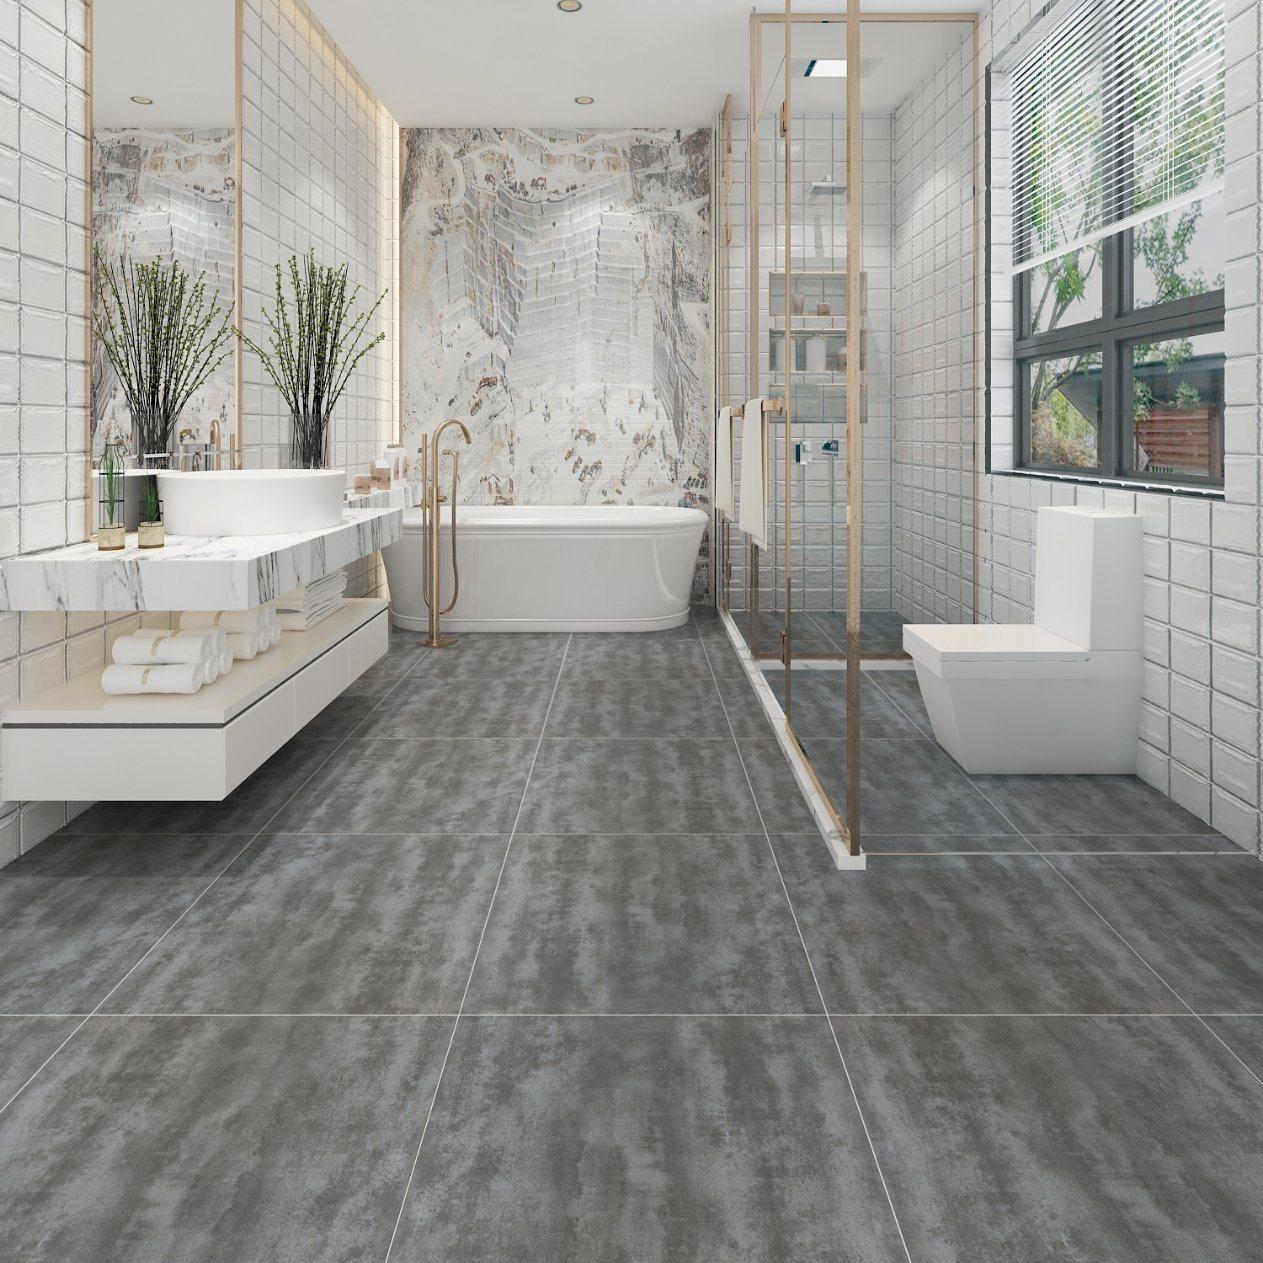 Bathroom Floor China Porcelain Tile, Porcelain Tile Bathroom Floor Cost